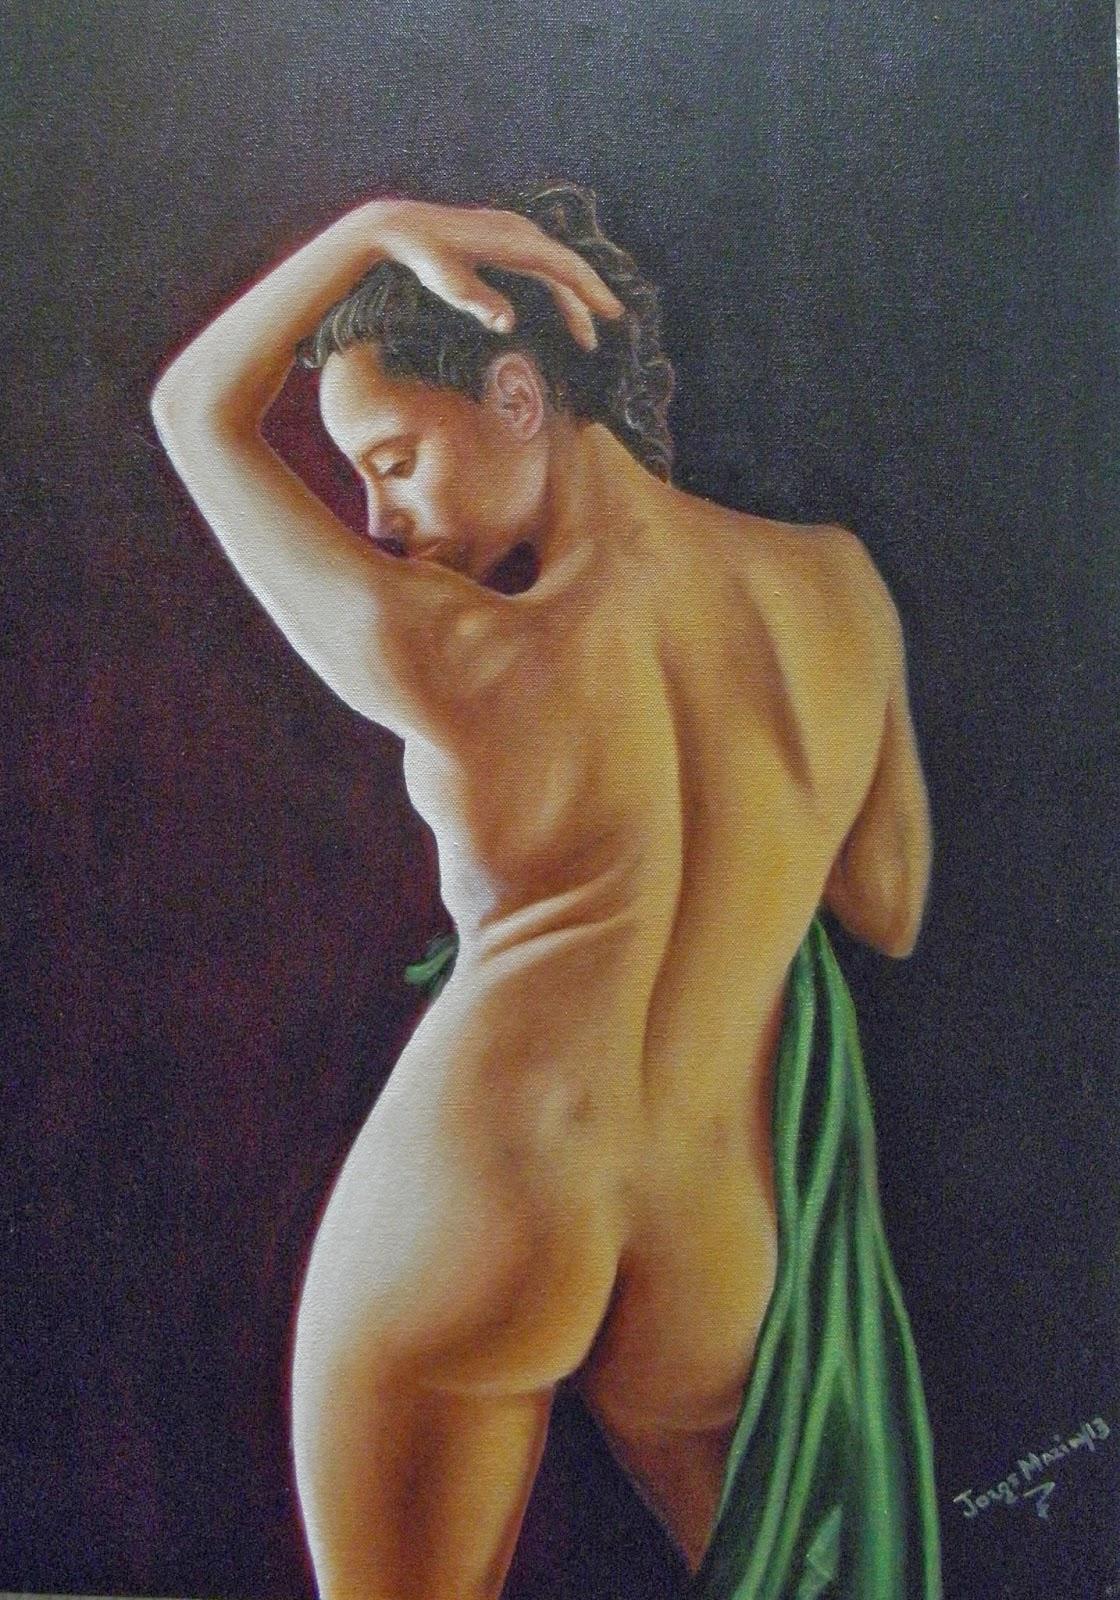 desnudo al oleo, Barbara, pintura realista